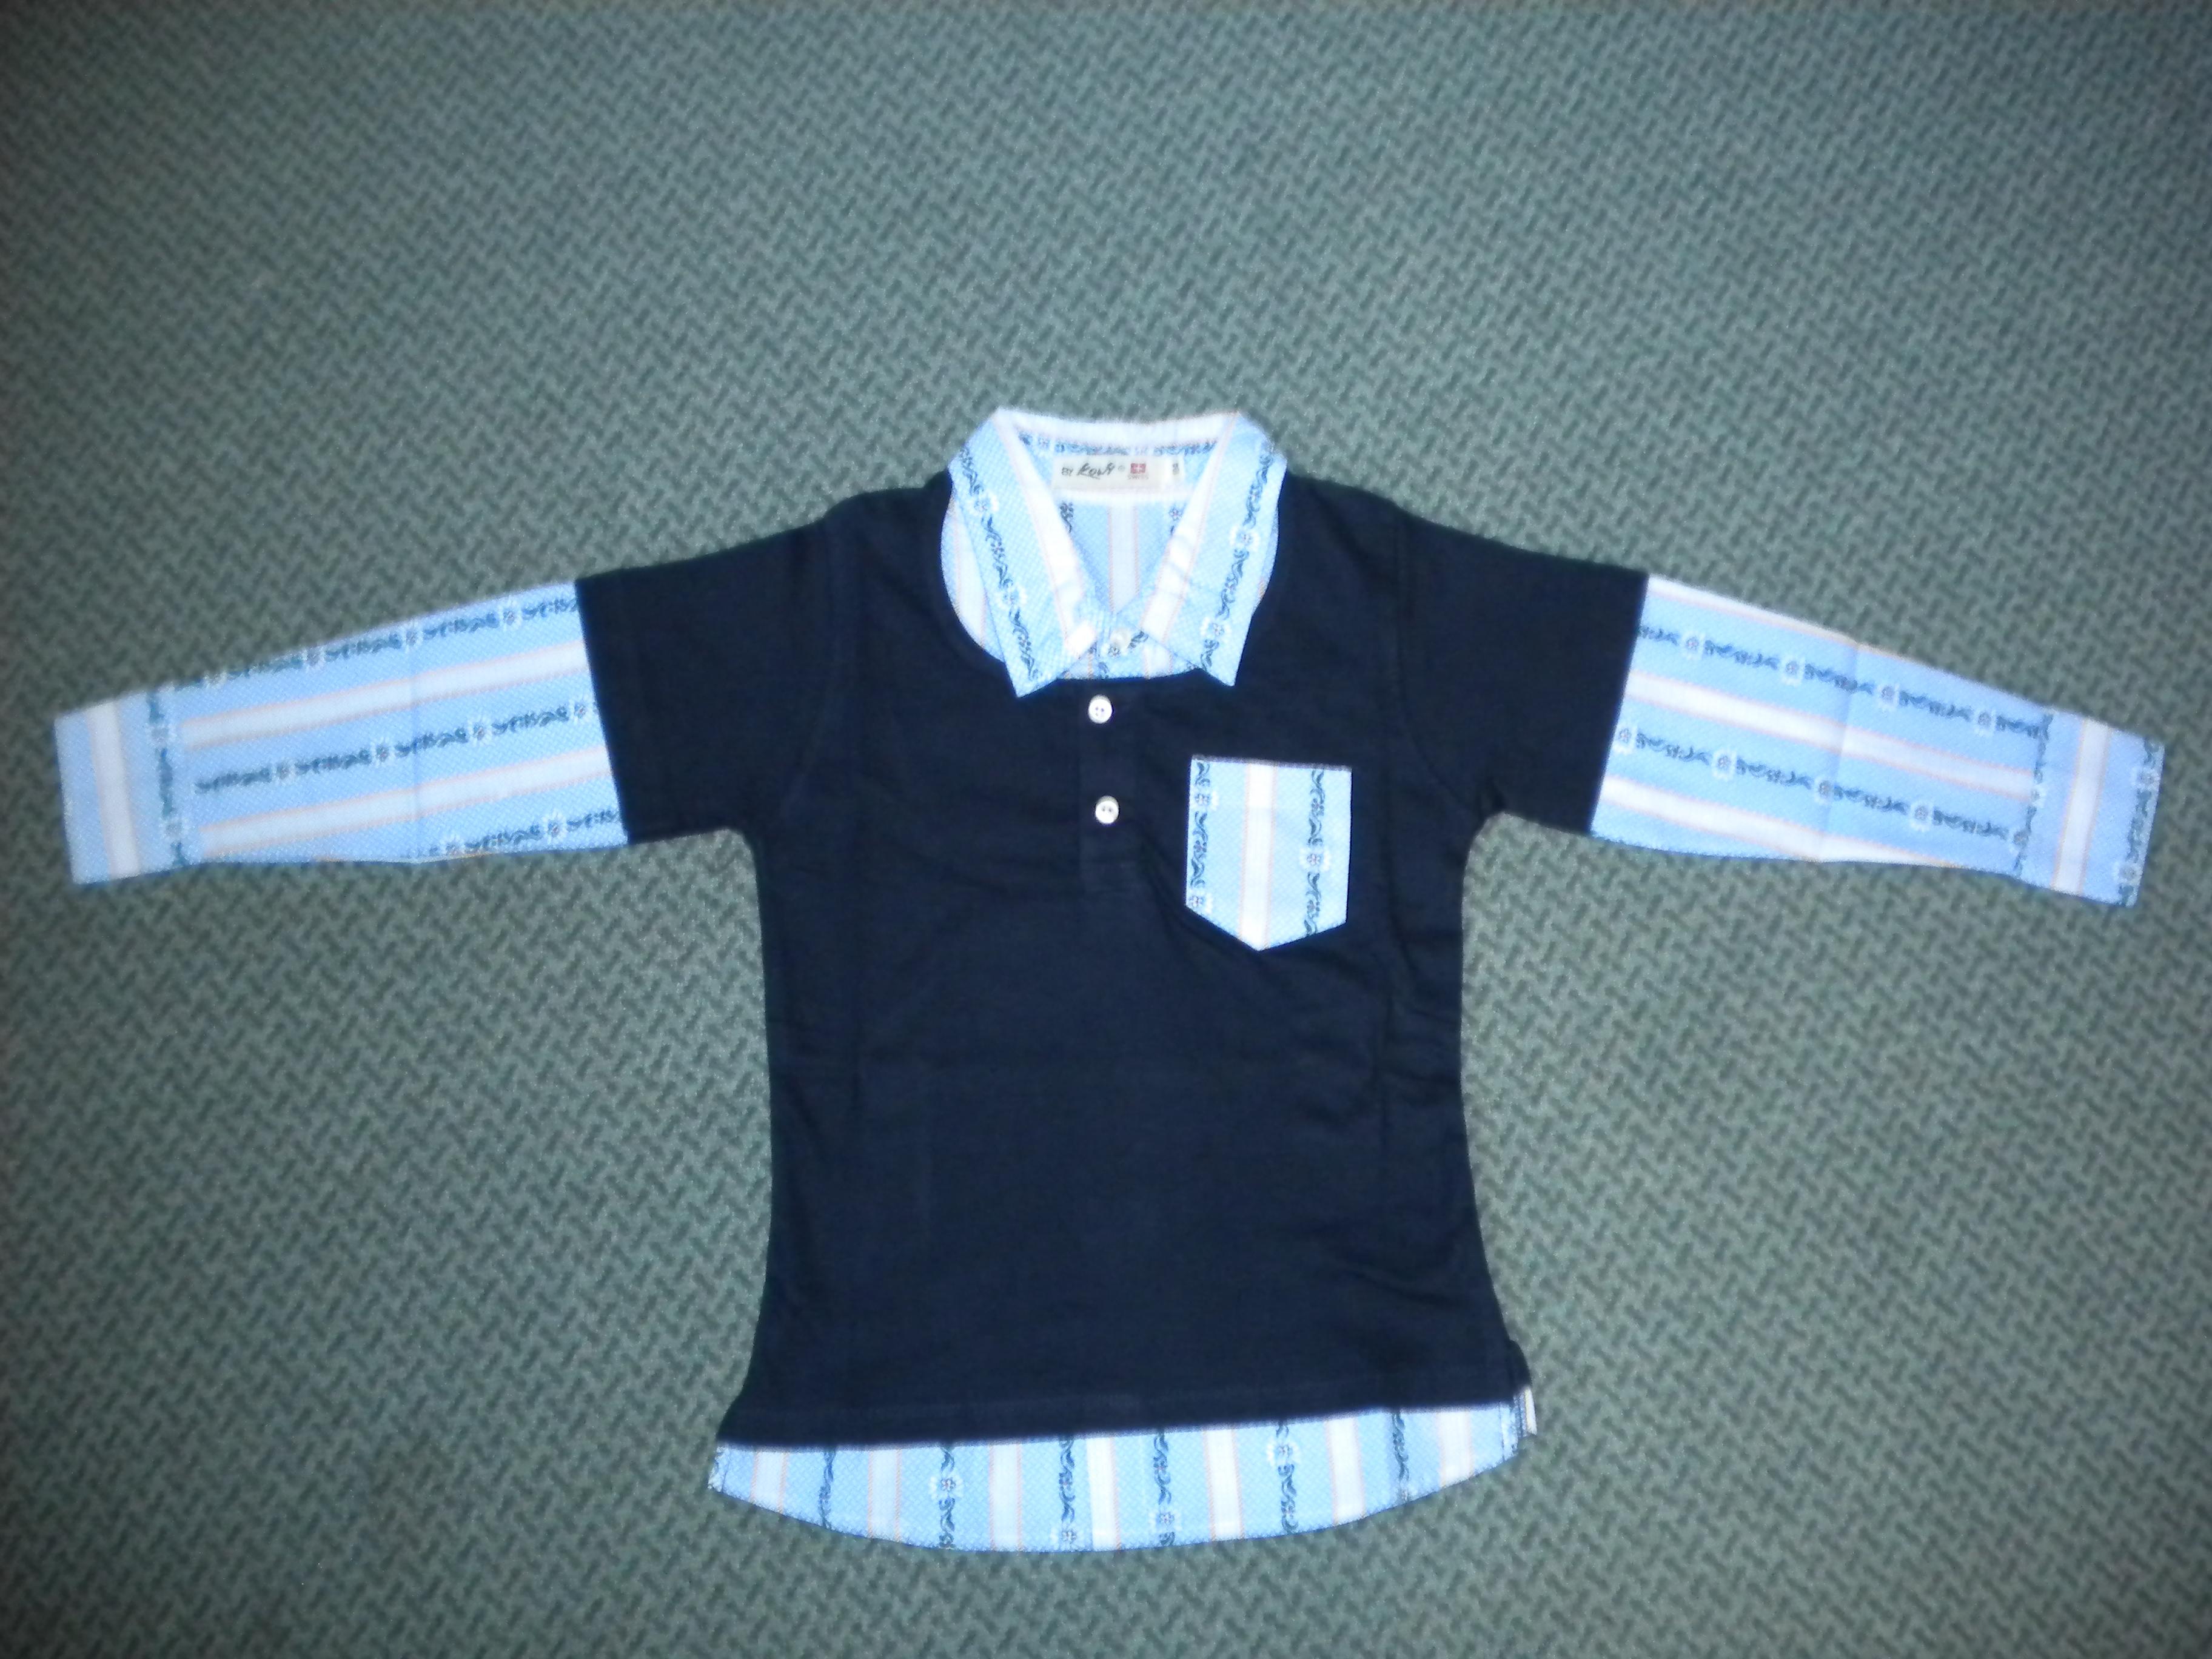 Polo Shirt dunkelblau mit Edelweiss Kragen